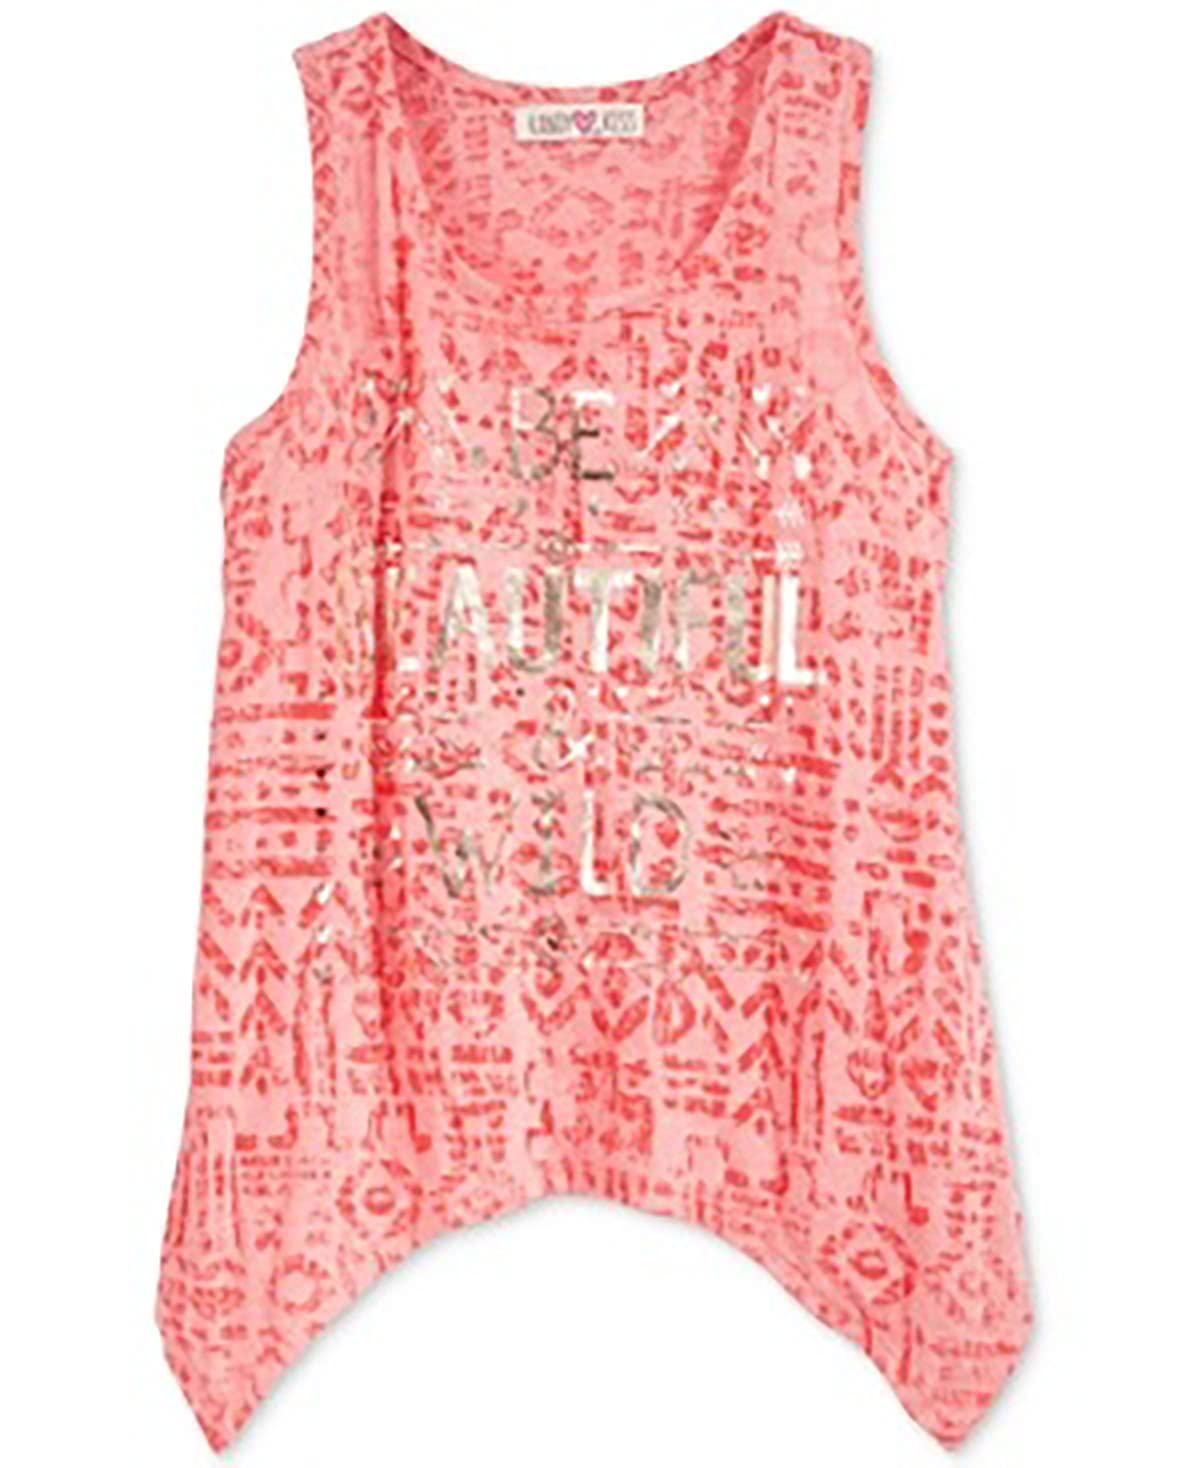 Kandy Kiss Girls Graphic-Print Handkerchief-Hem Tank Top Coral